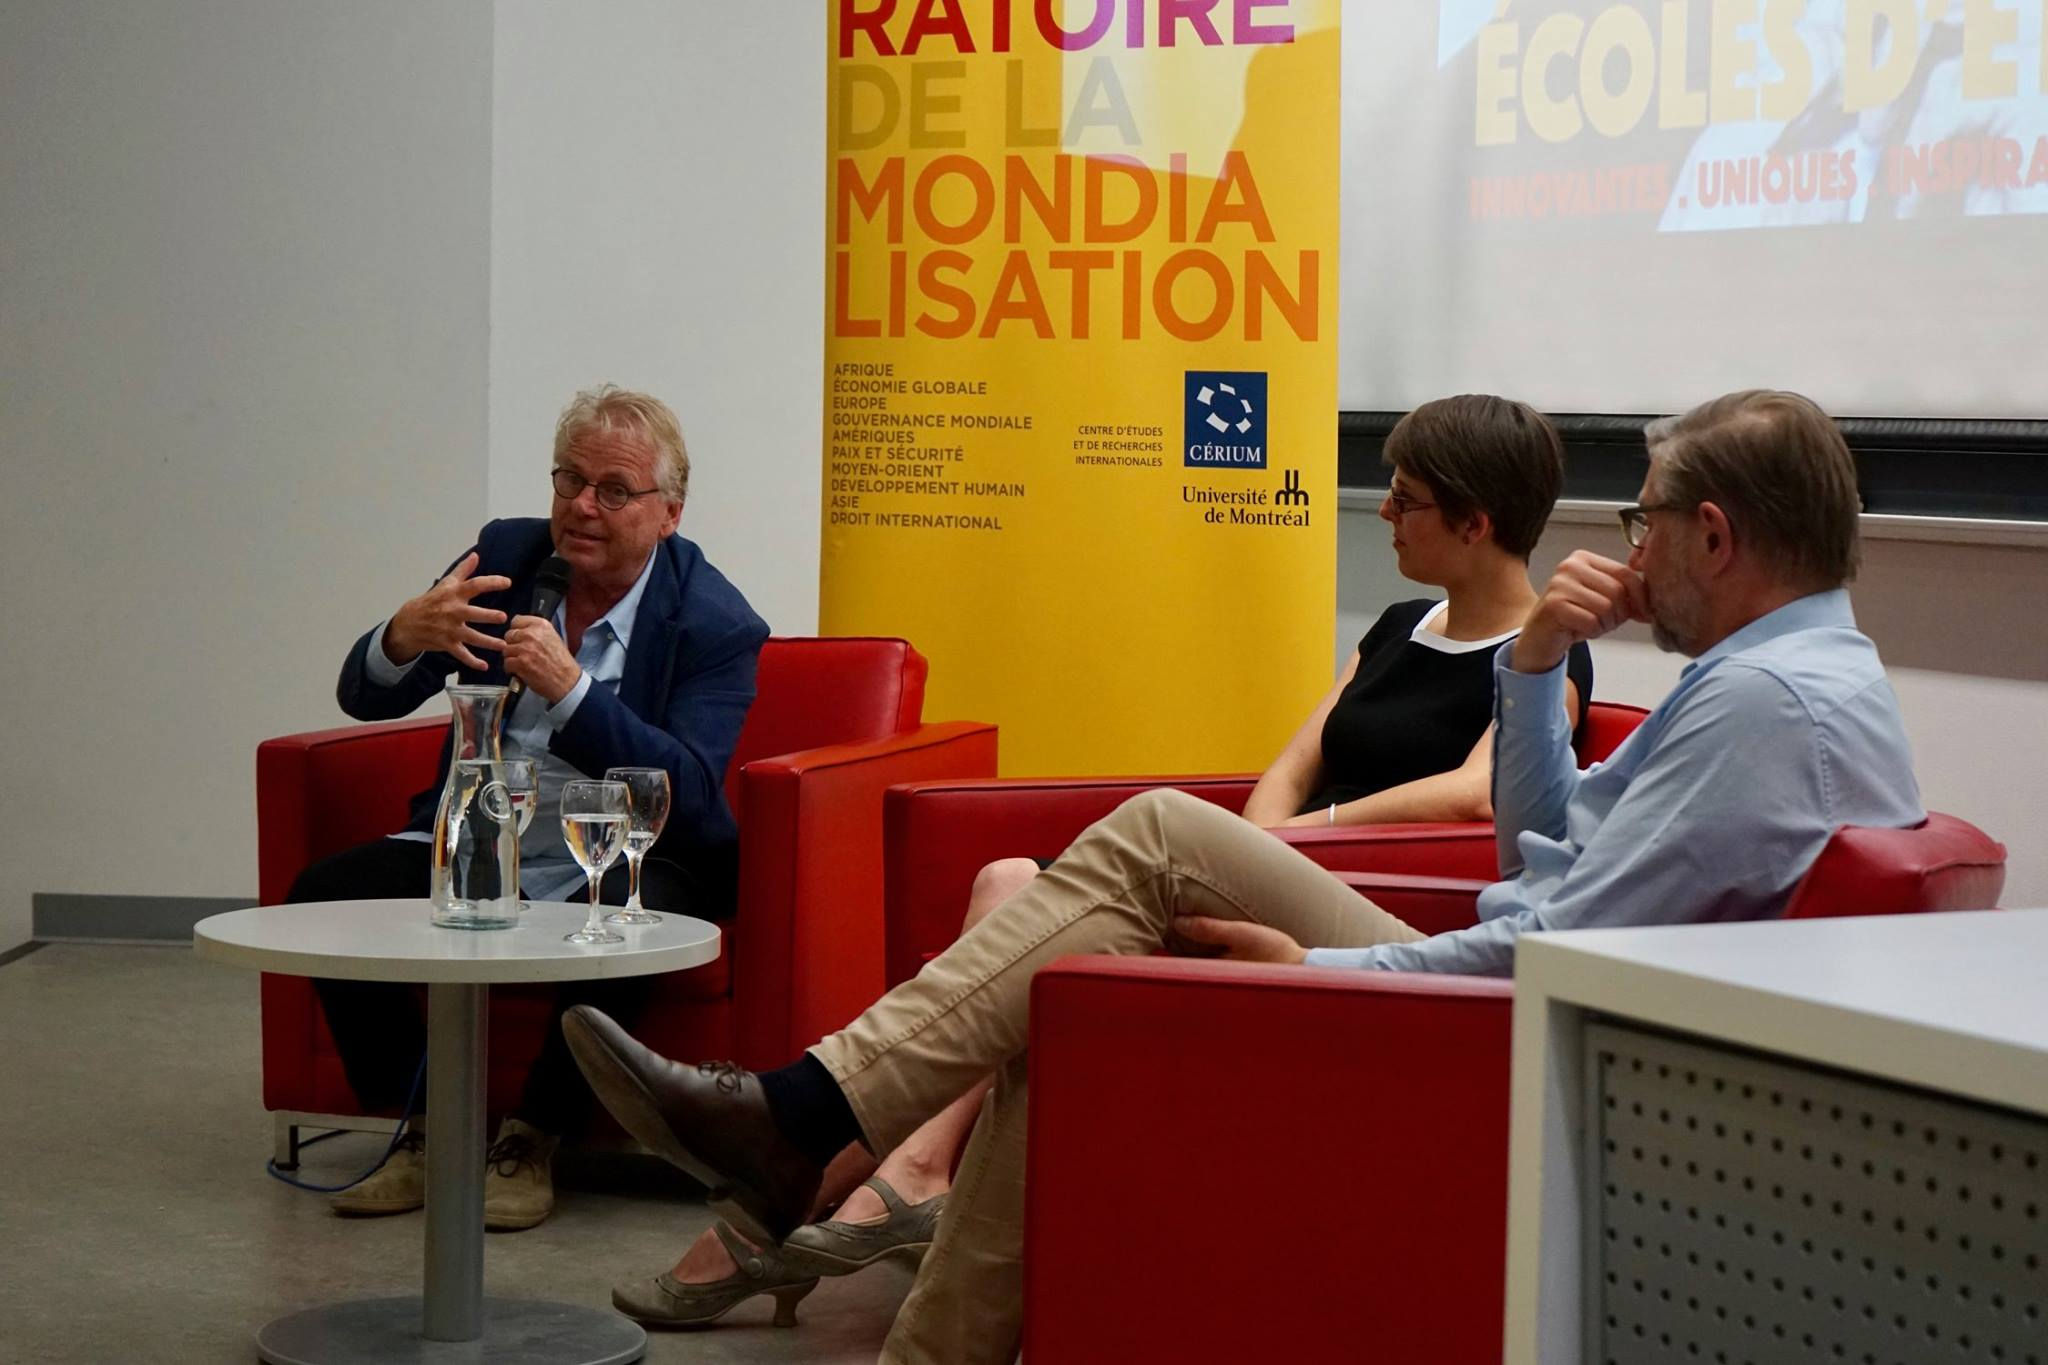 Quand Daniel Cohn-Bendit et Jean Quatremer parlent d'Europe